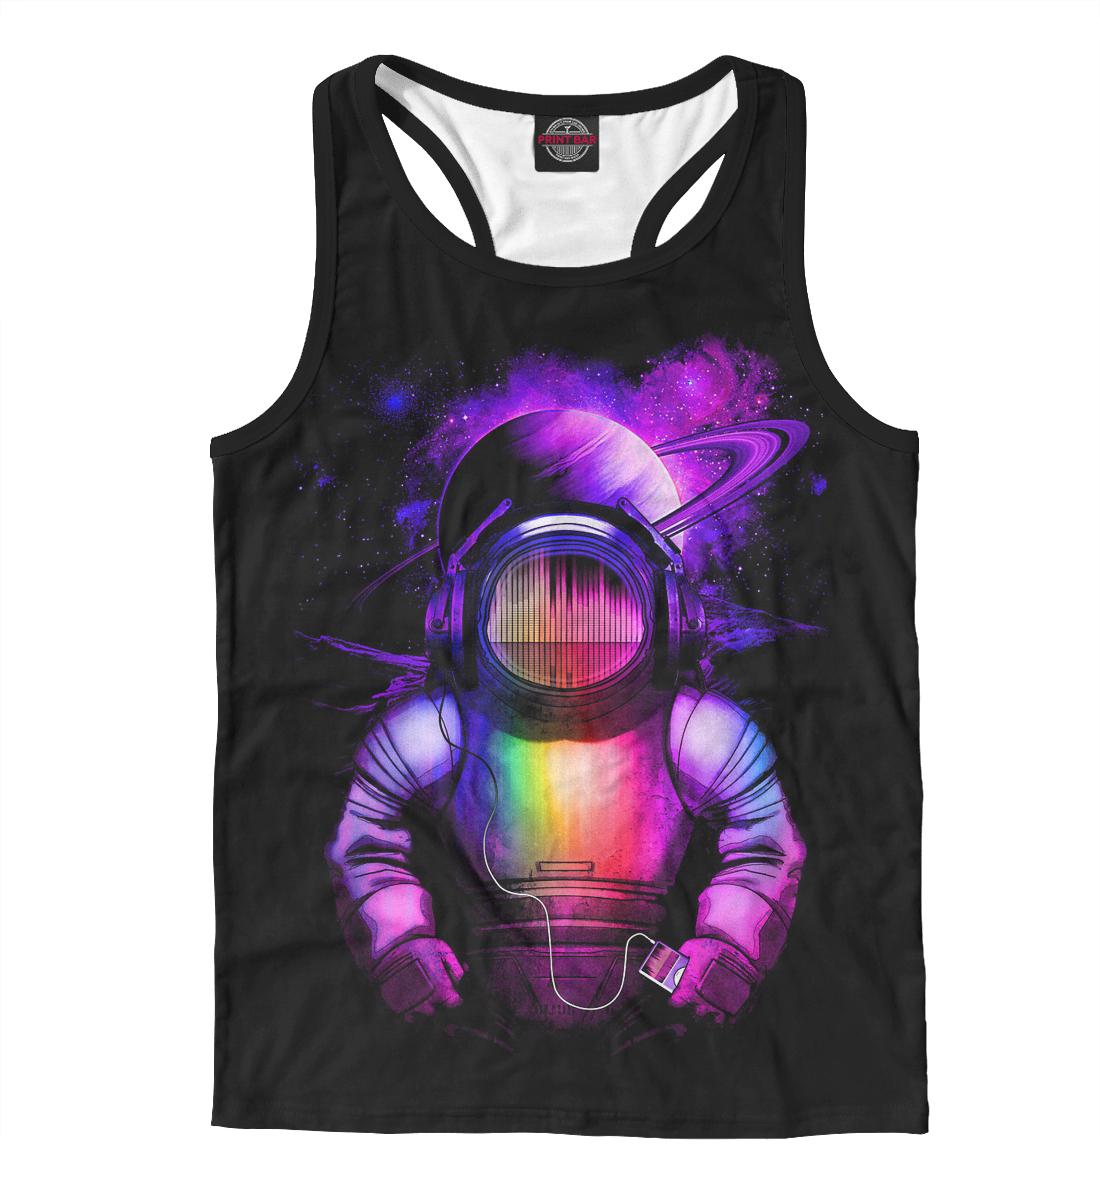 Купить Космонавт с айподом, Printbar, Майки борцовки, MZK-647553-mayb-2